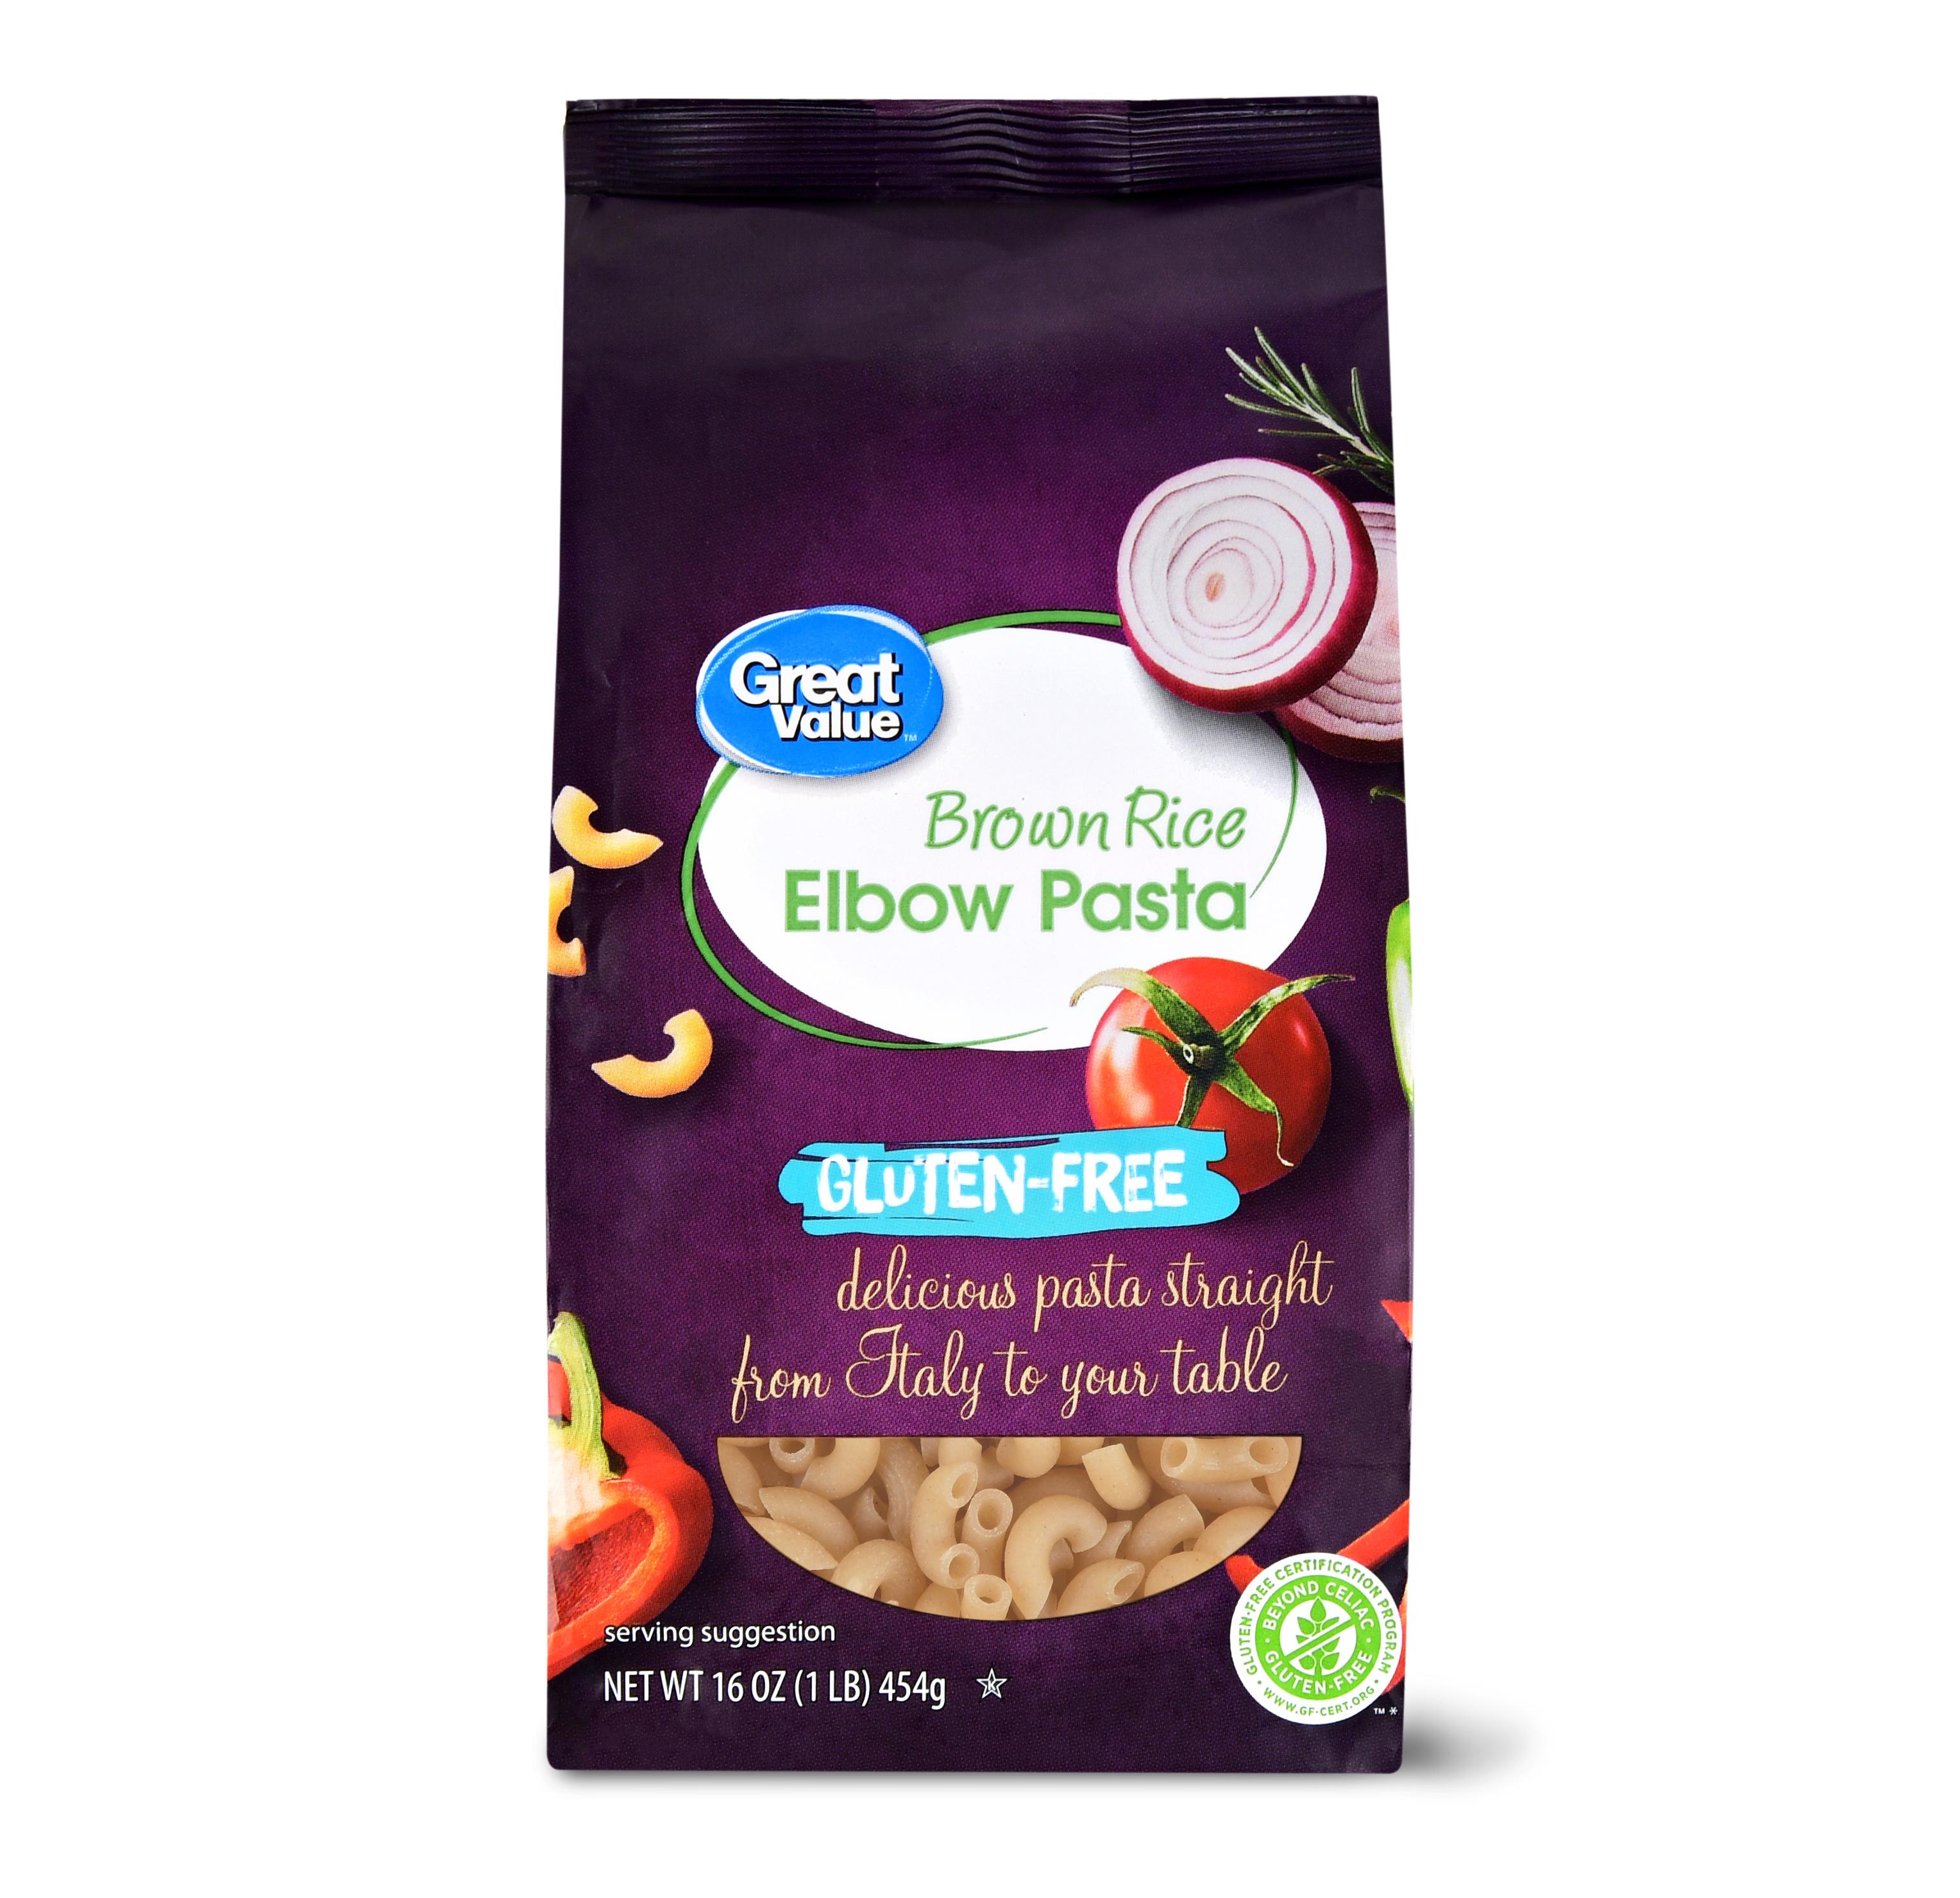 Great Value Gluten-Free Brown Rice Elbow Pasta, 16 Oz